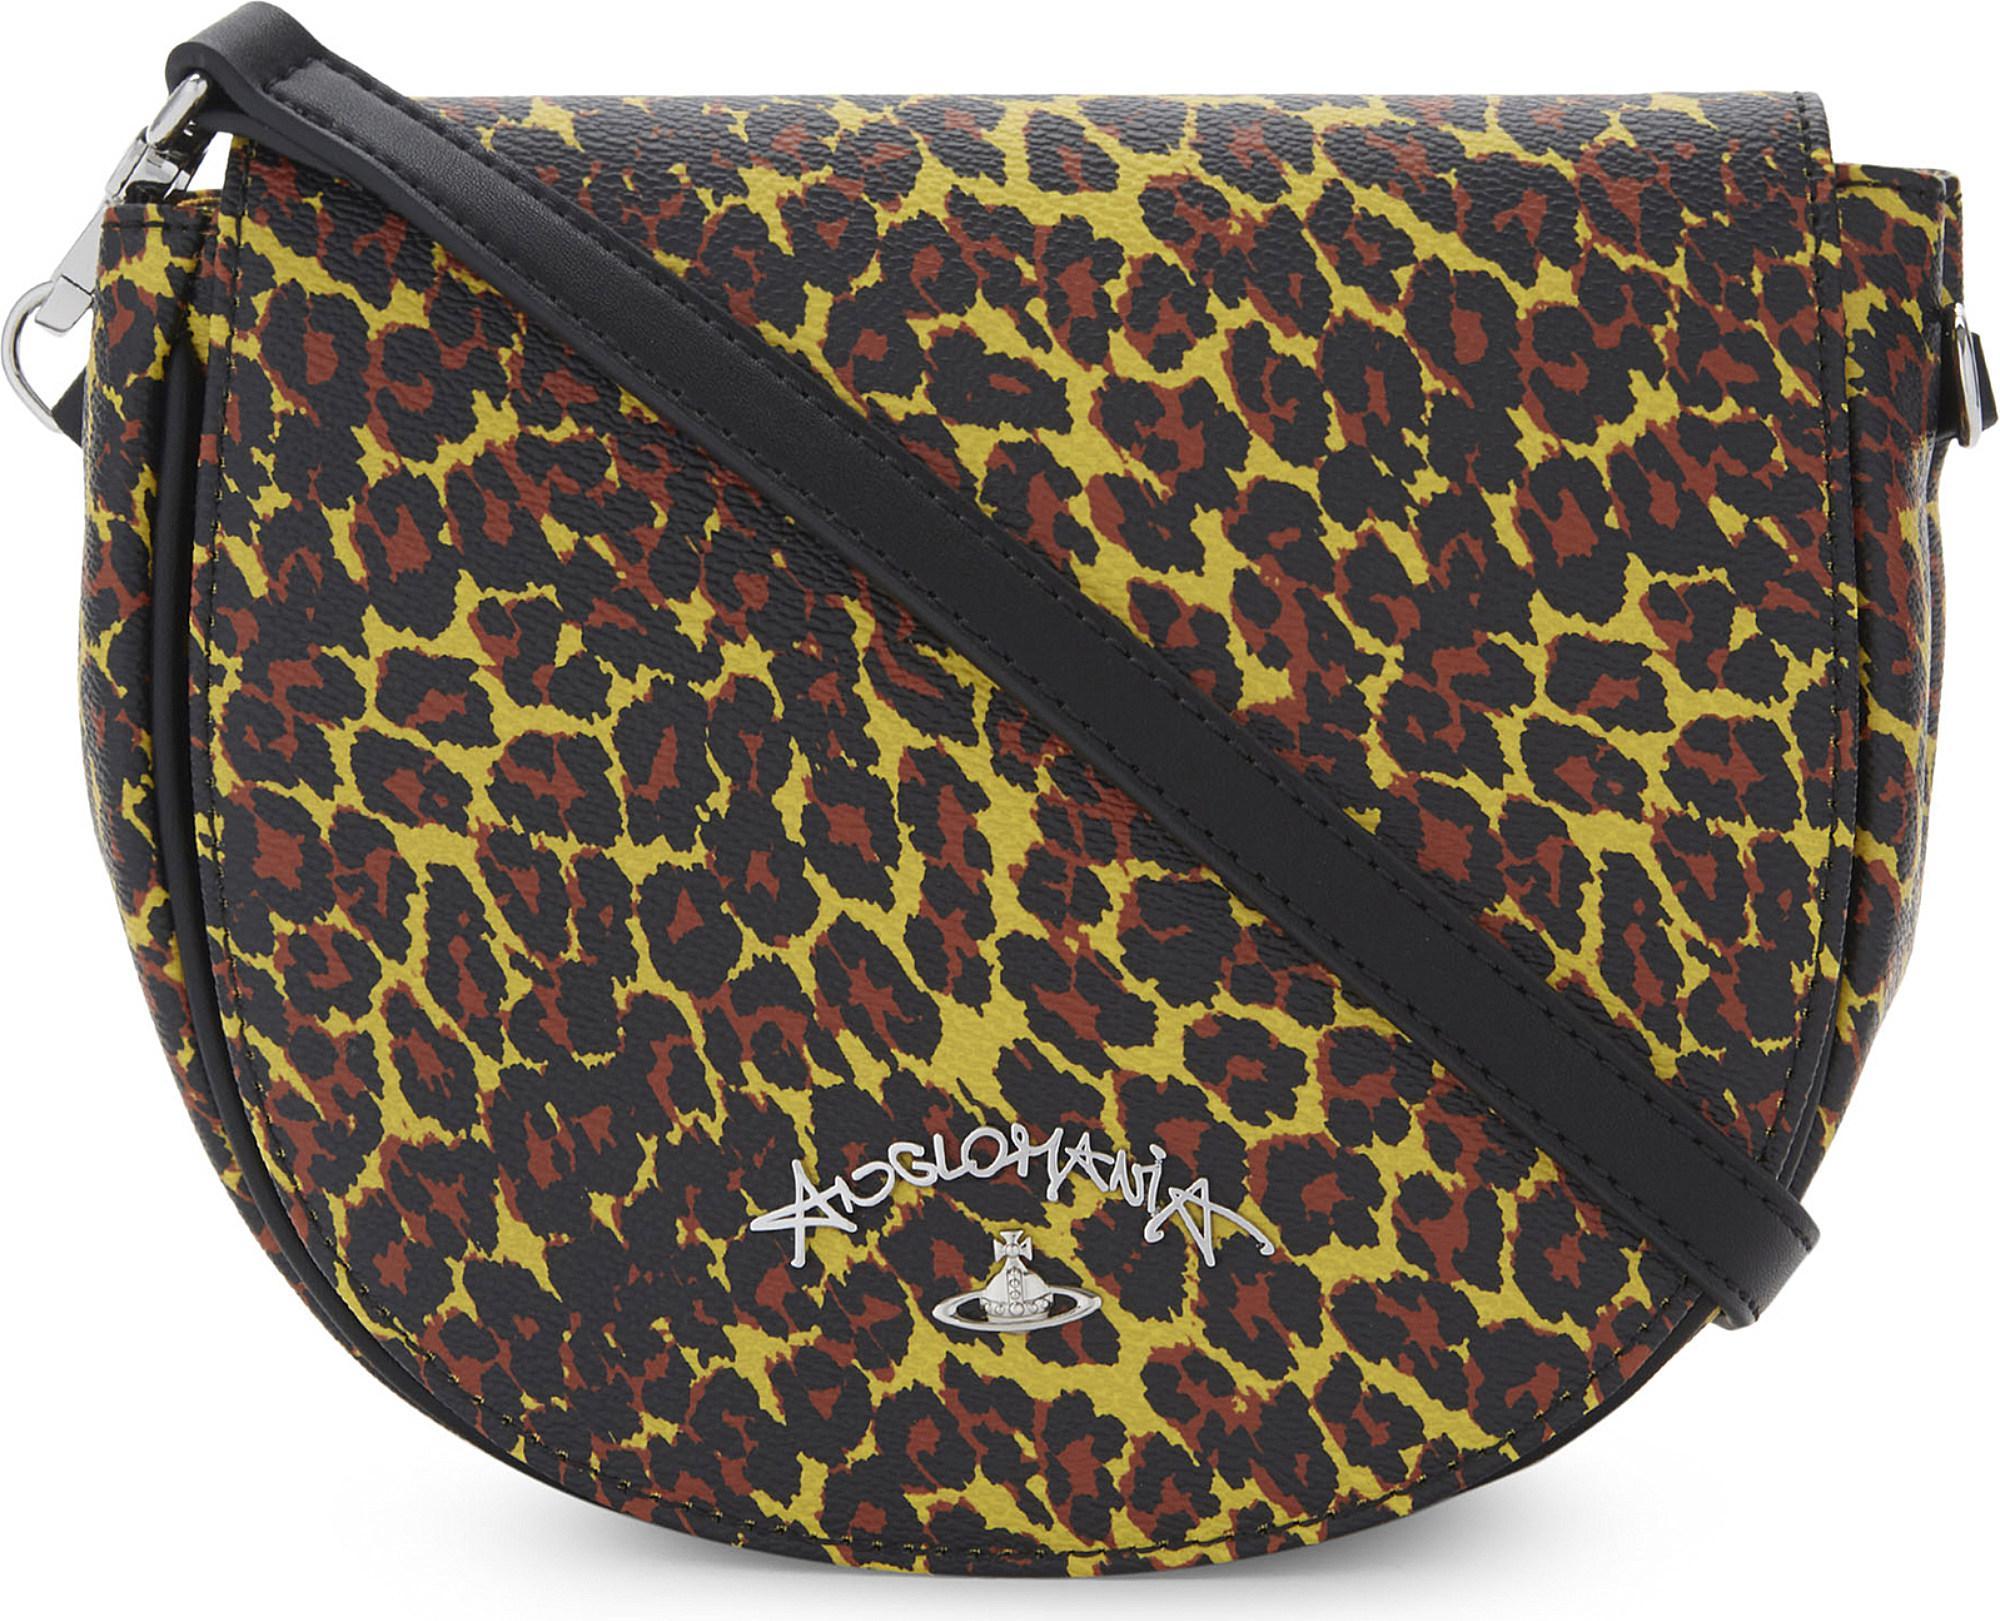 d8cfae6a8bfa Vivienne Westwood Anglomania Leopard-print Leather Shoulder Bag in ...